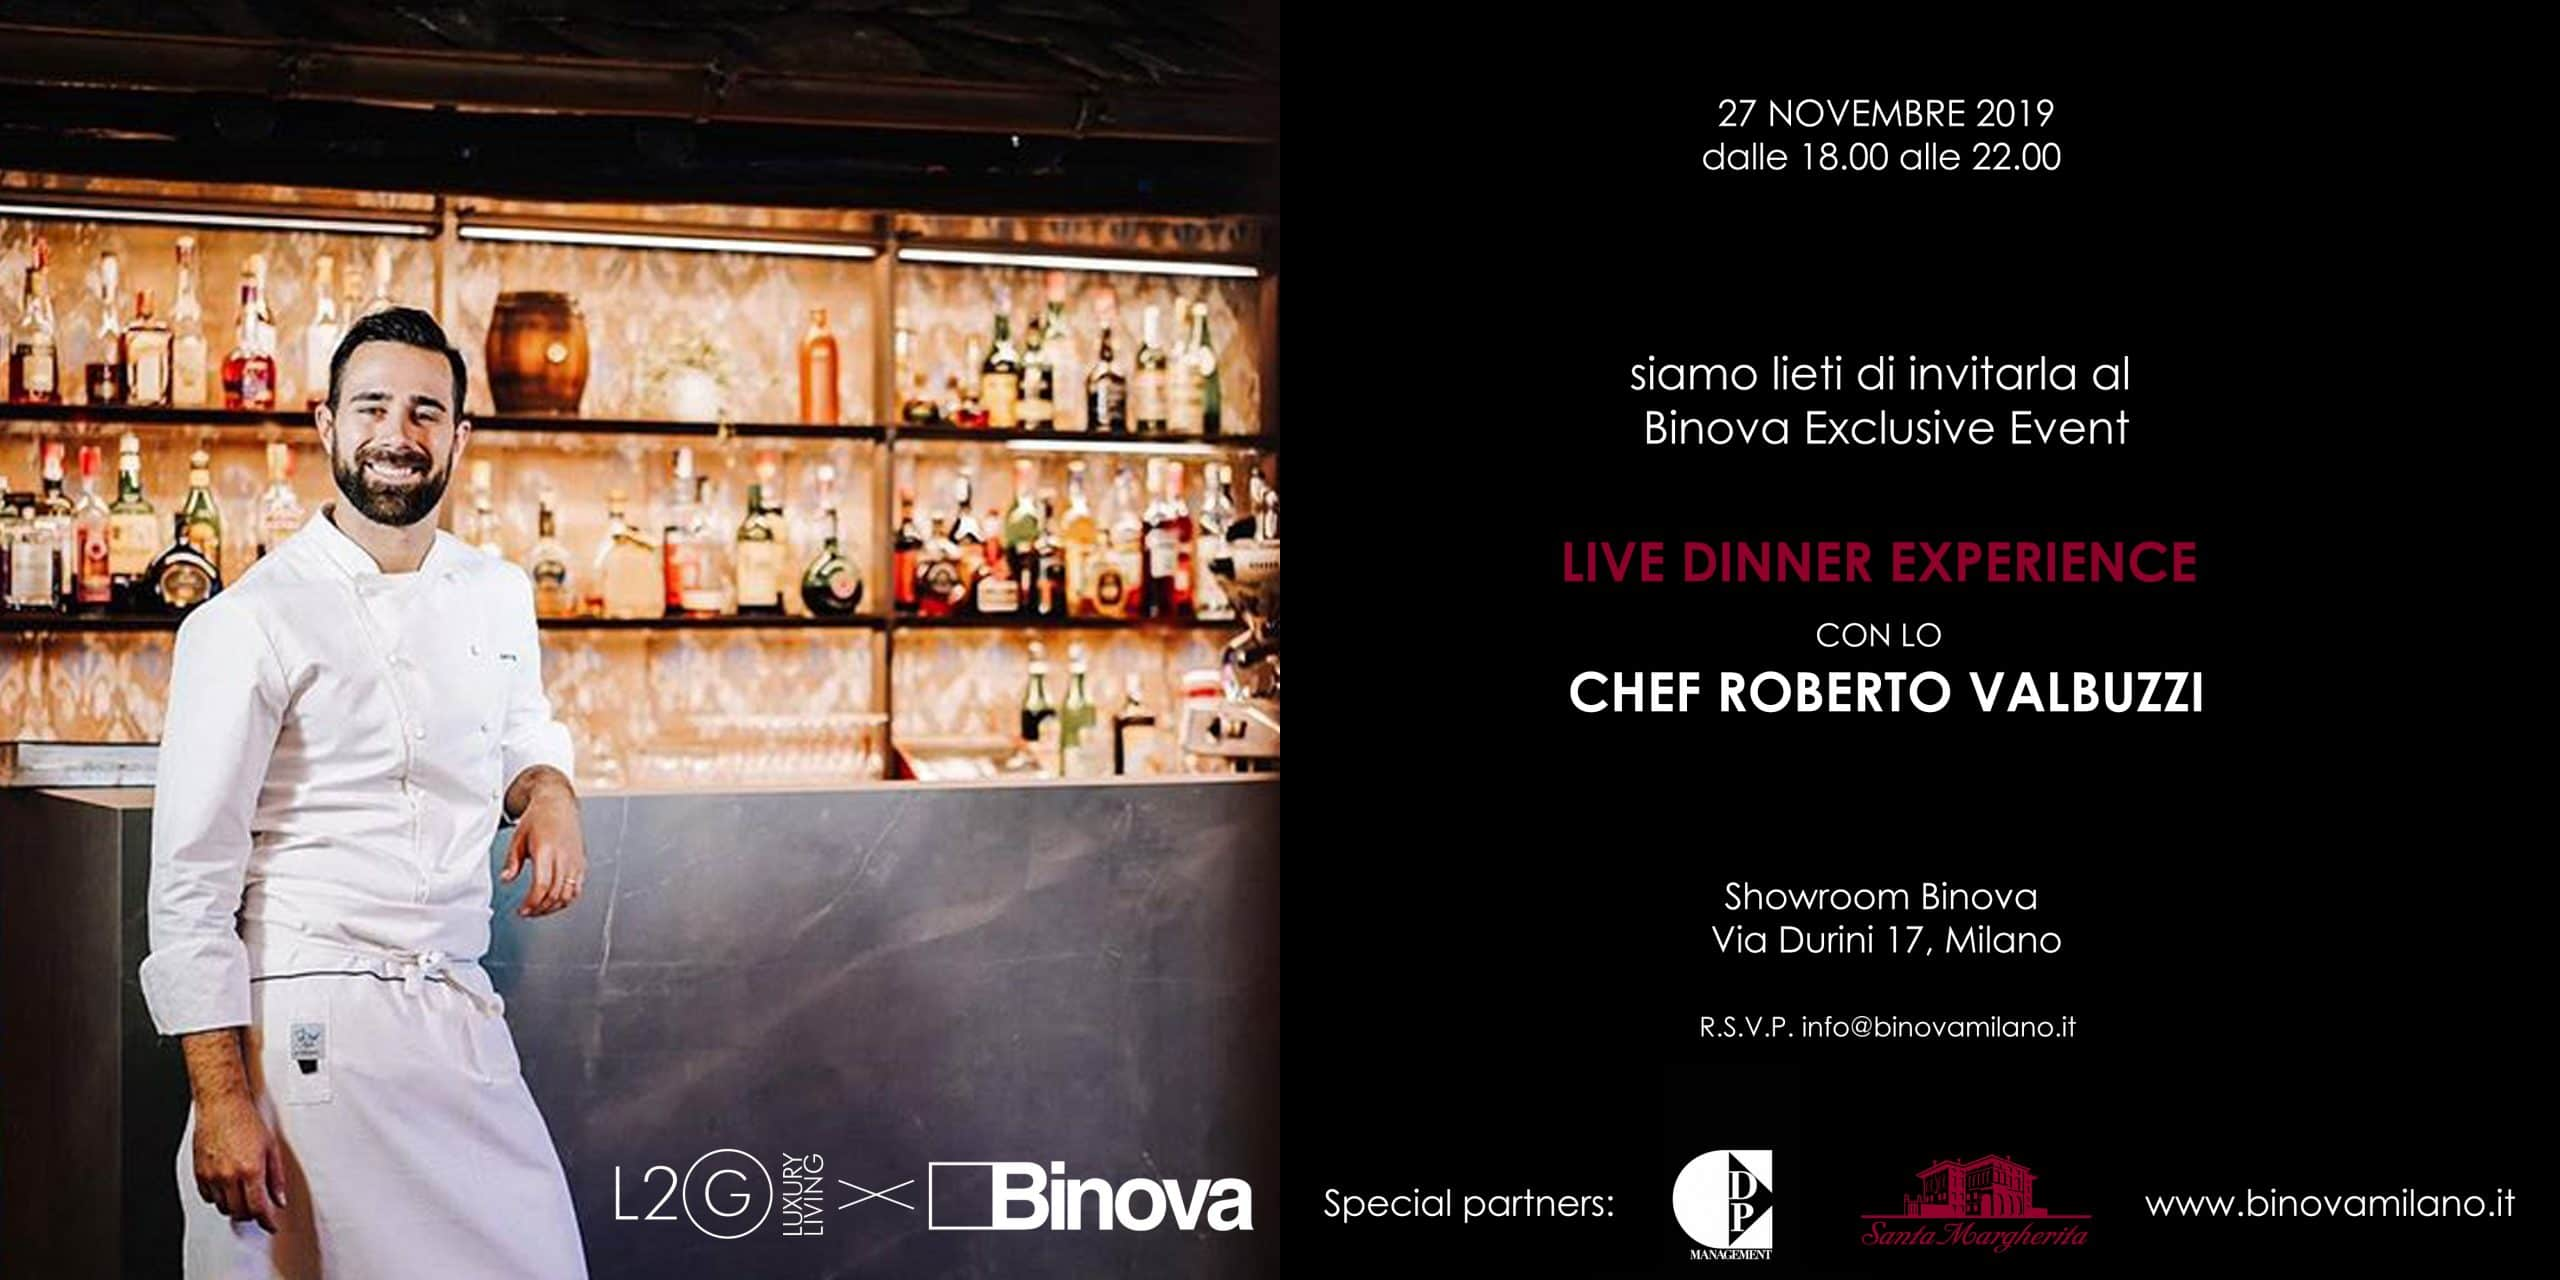 Binova live dinner experience Chef Roberto Valbuzzi